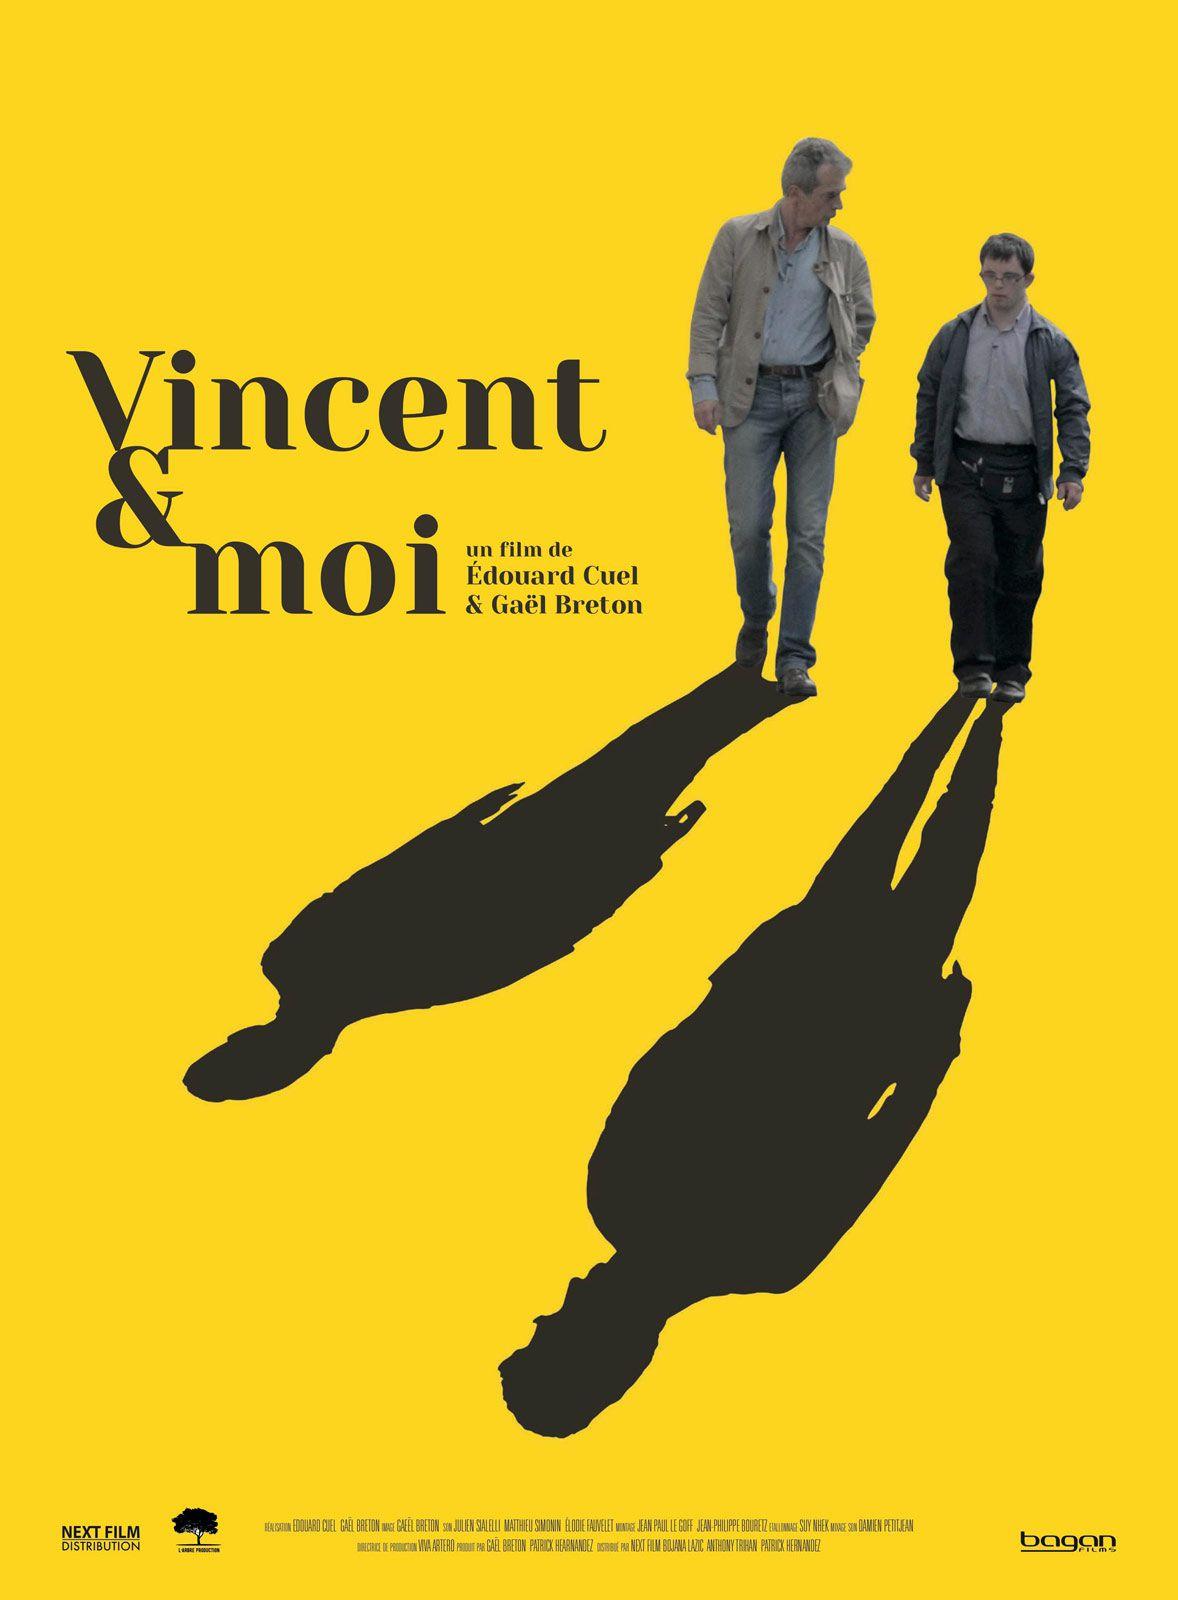 Vincent & moi - Documentaire (2018)